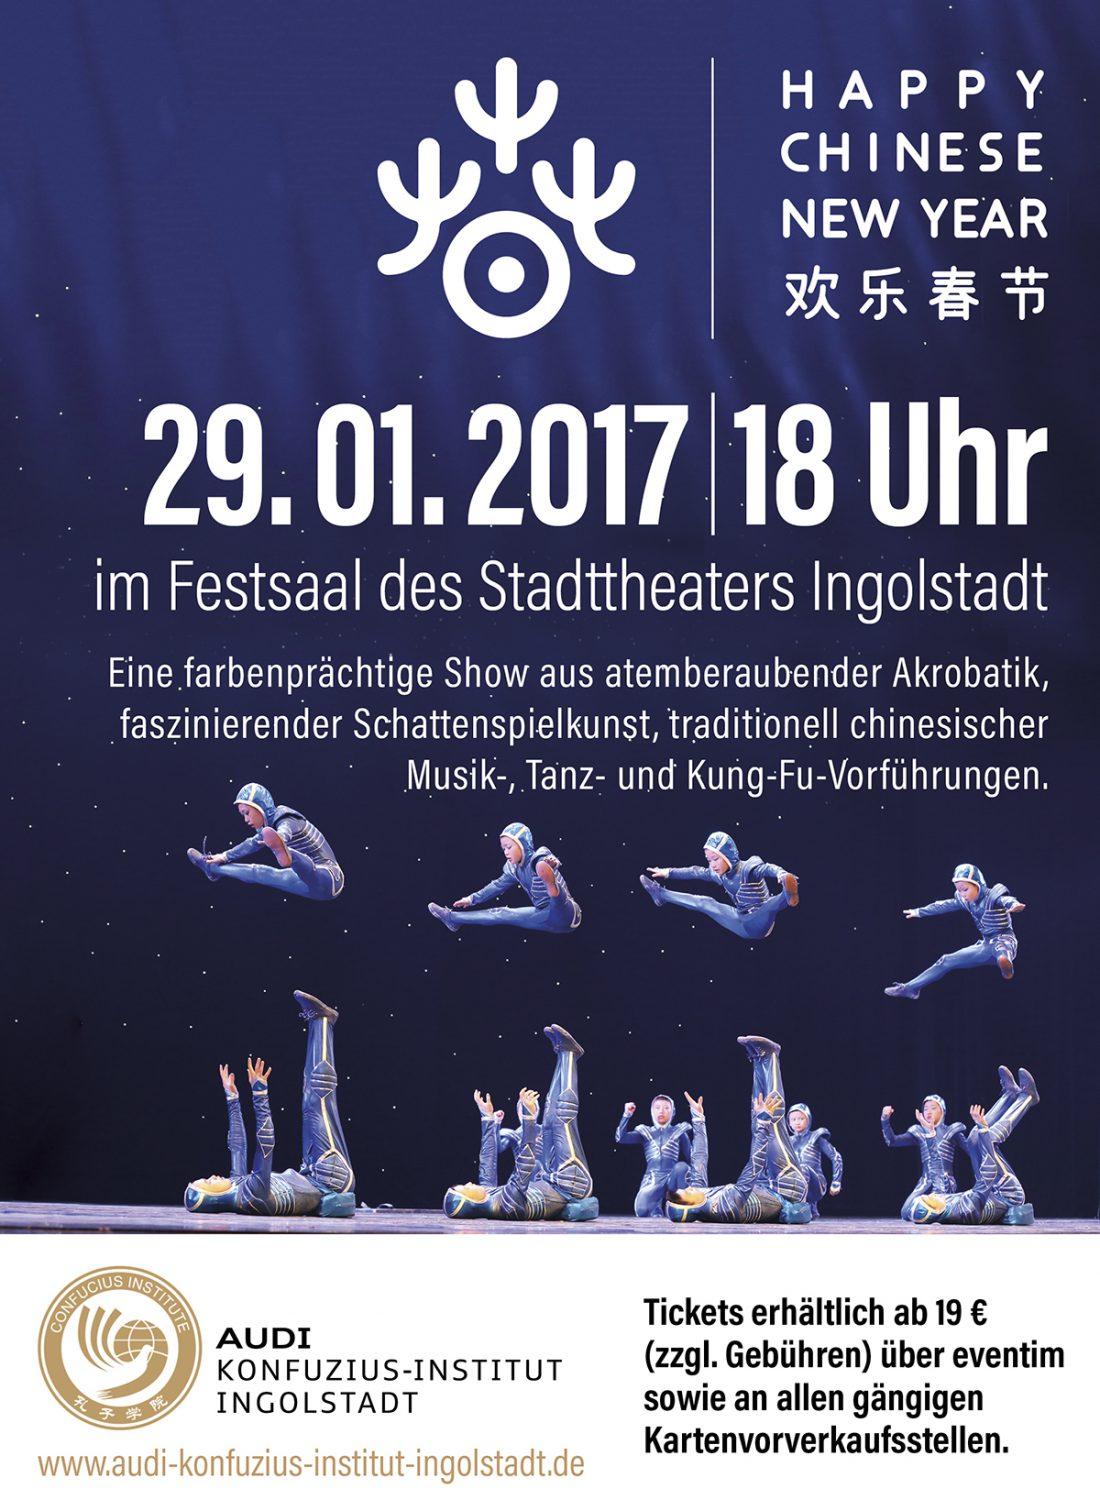 Happy Chinese New Year 2017 - AUDI Konfuzius-Institut Ingolstadt